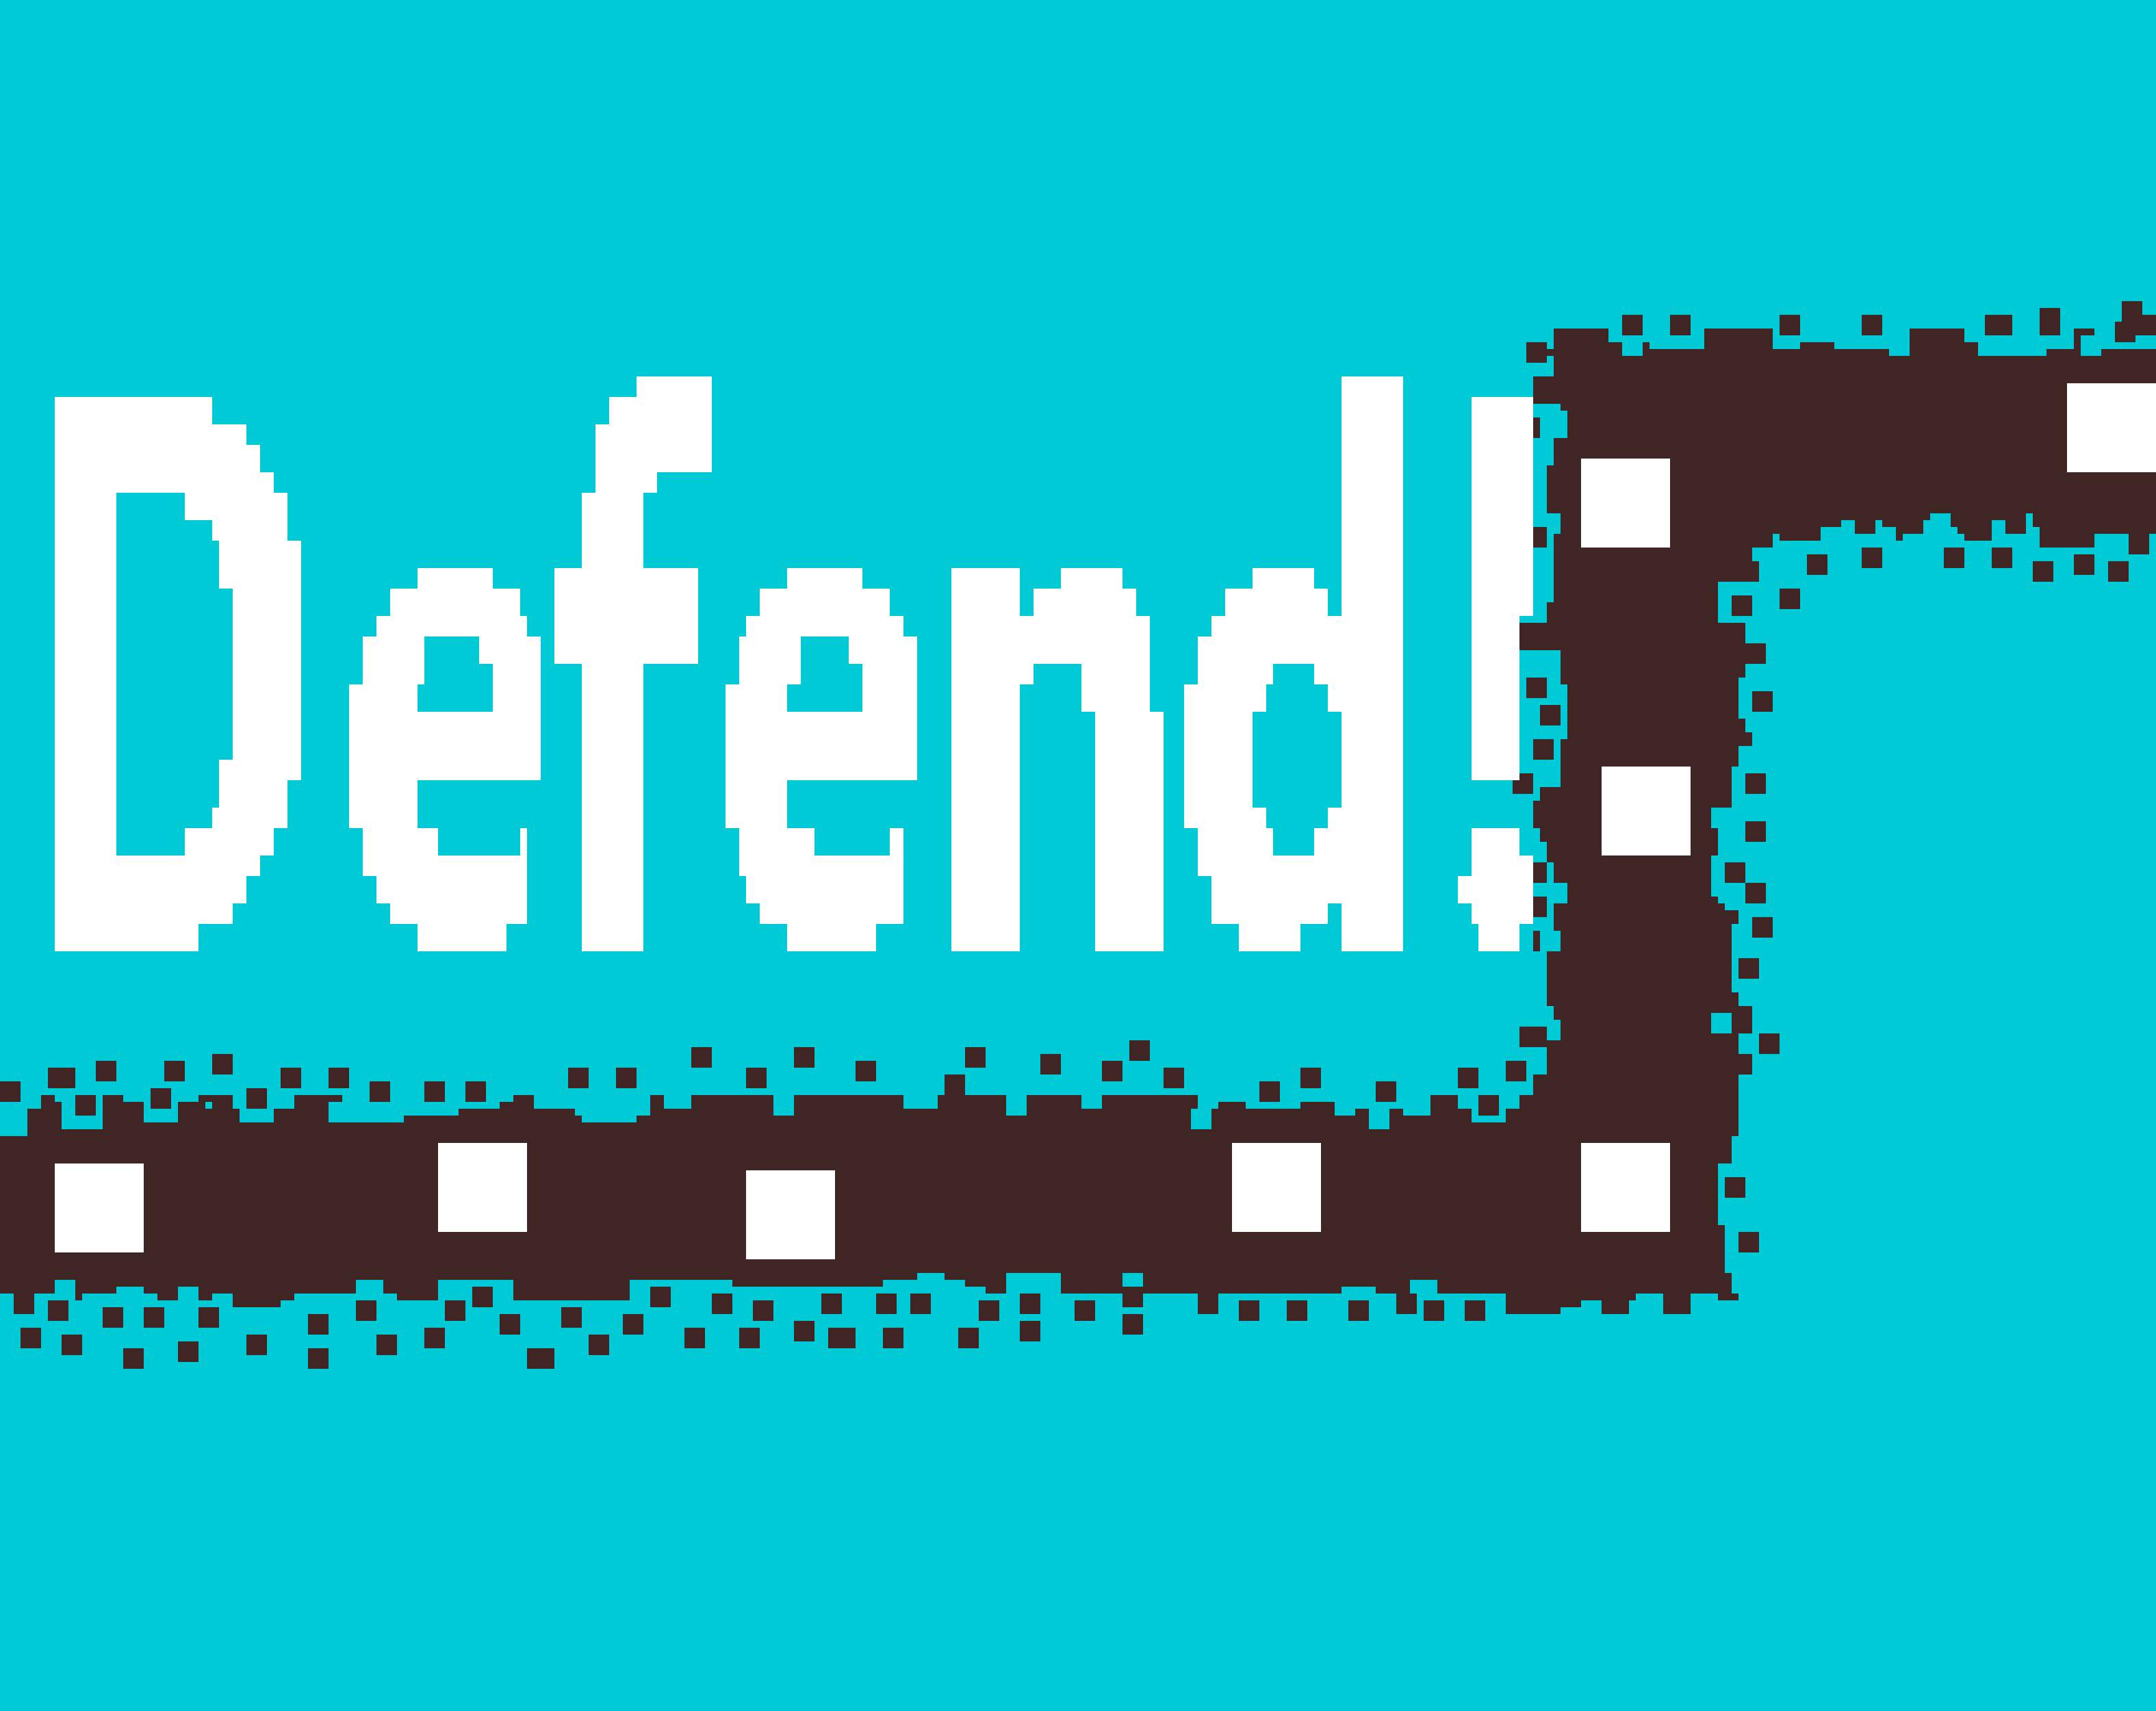 Defend!